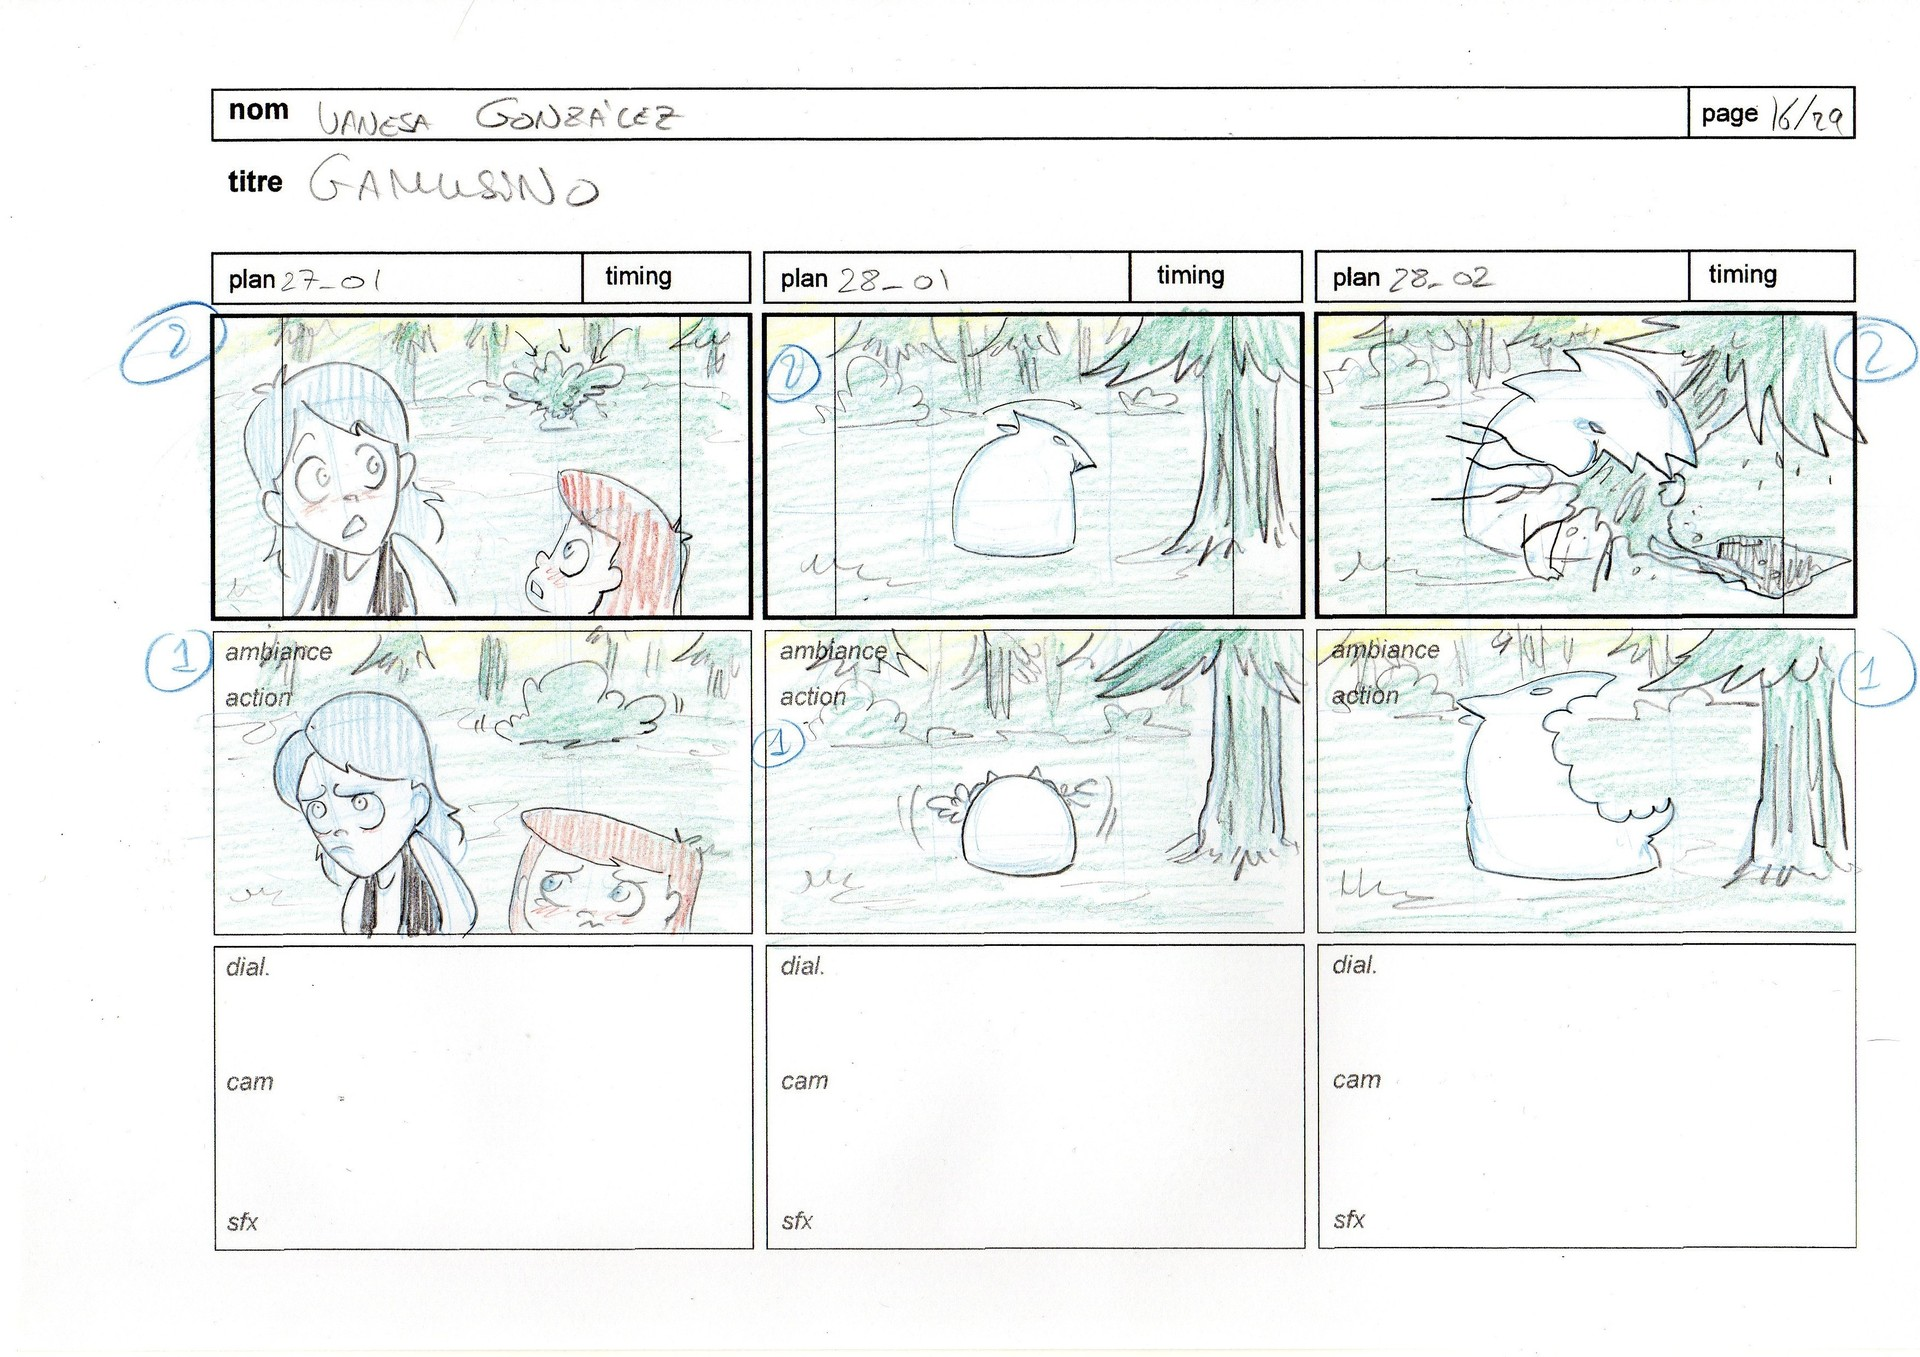 Vanesa gonzalez storyboard gamusino pages 16